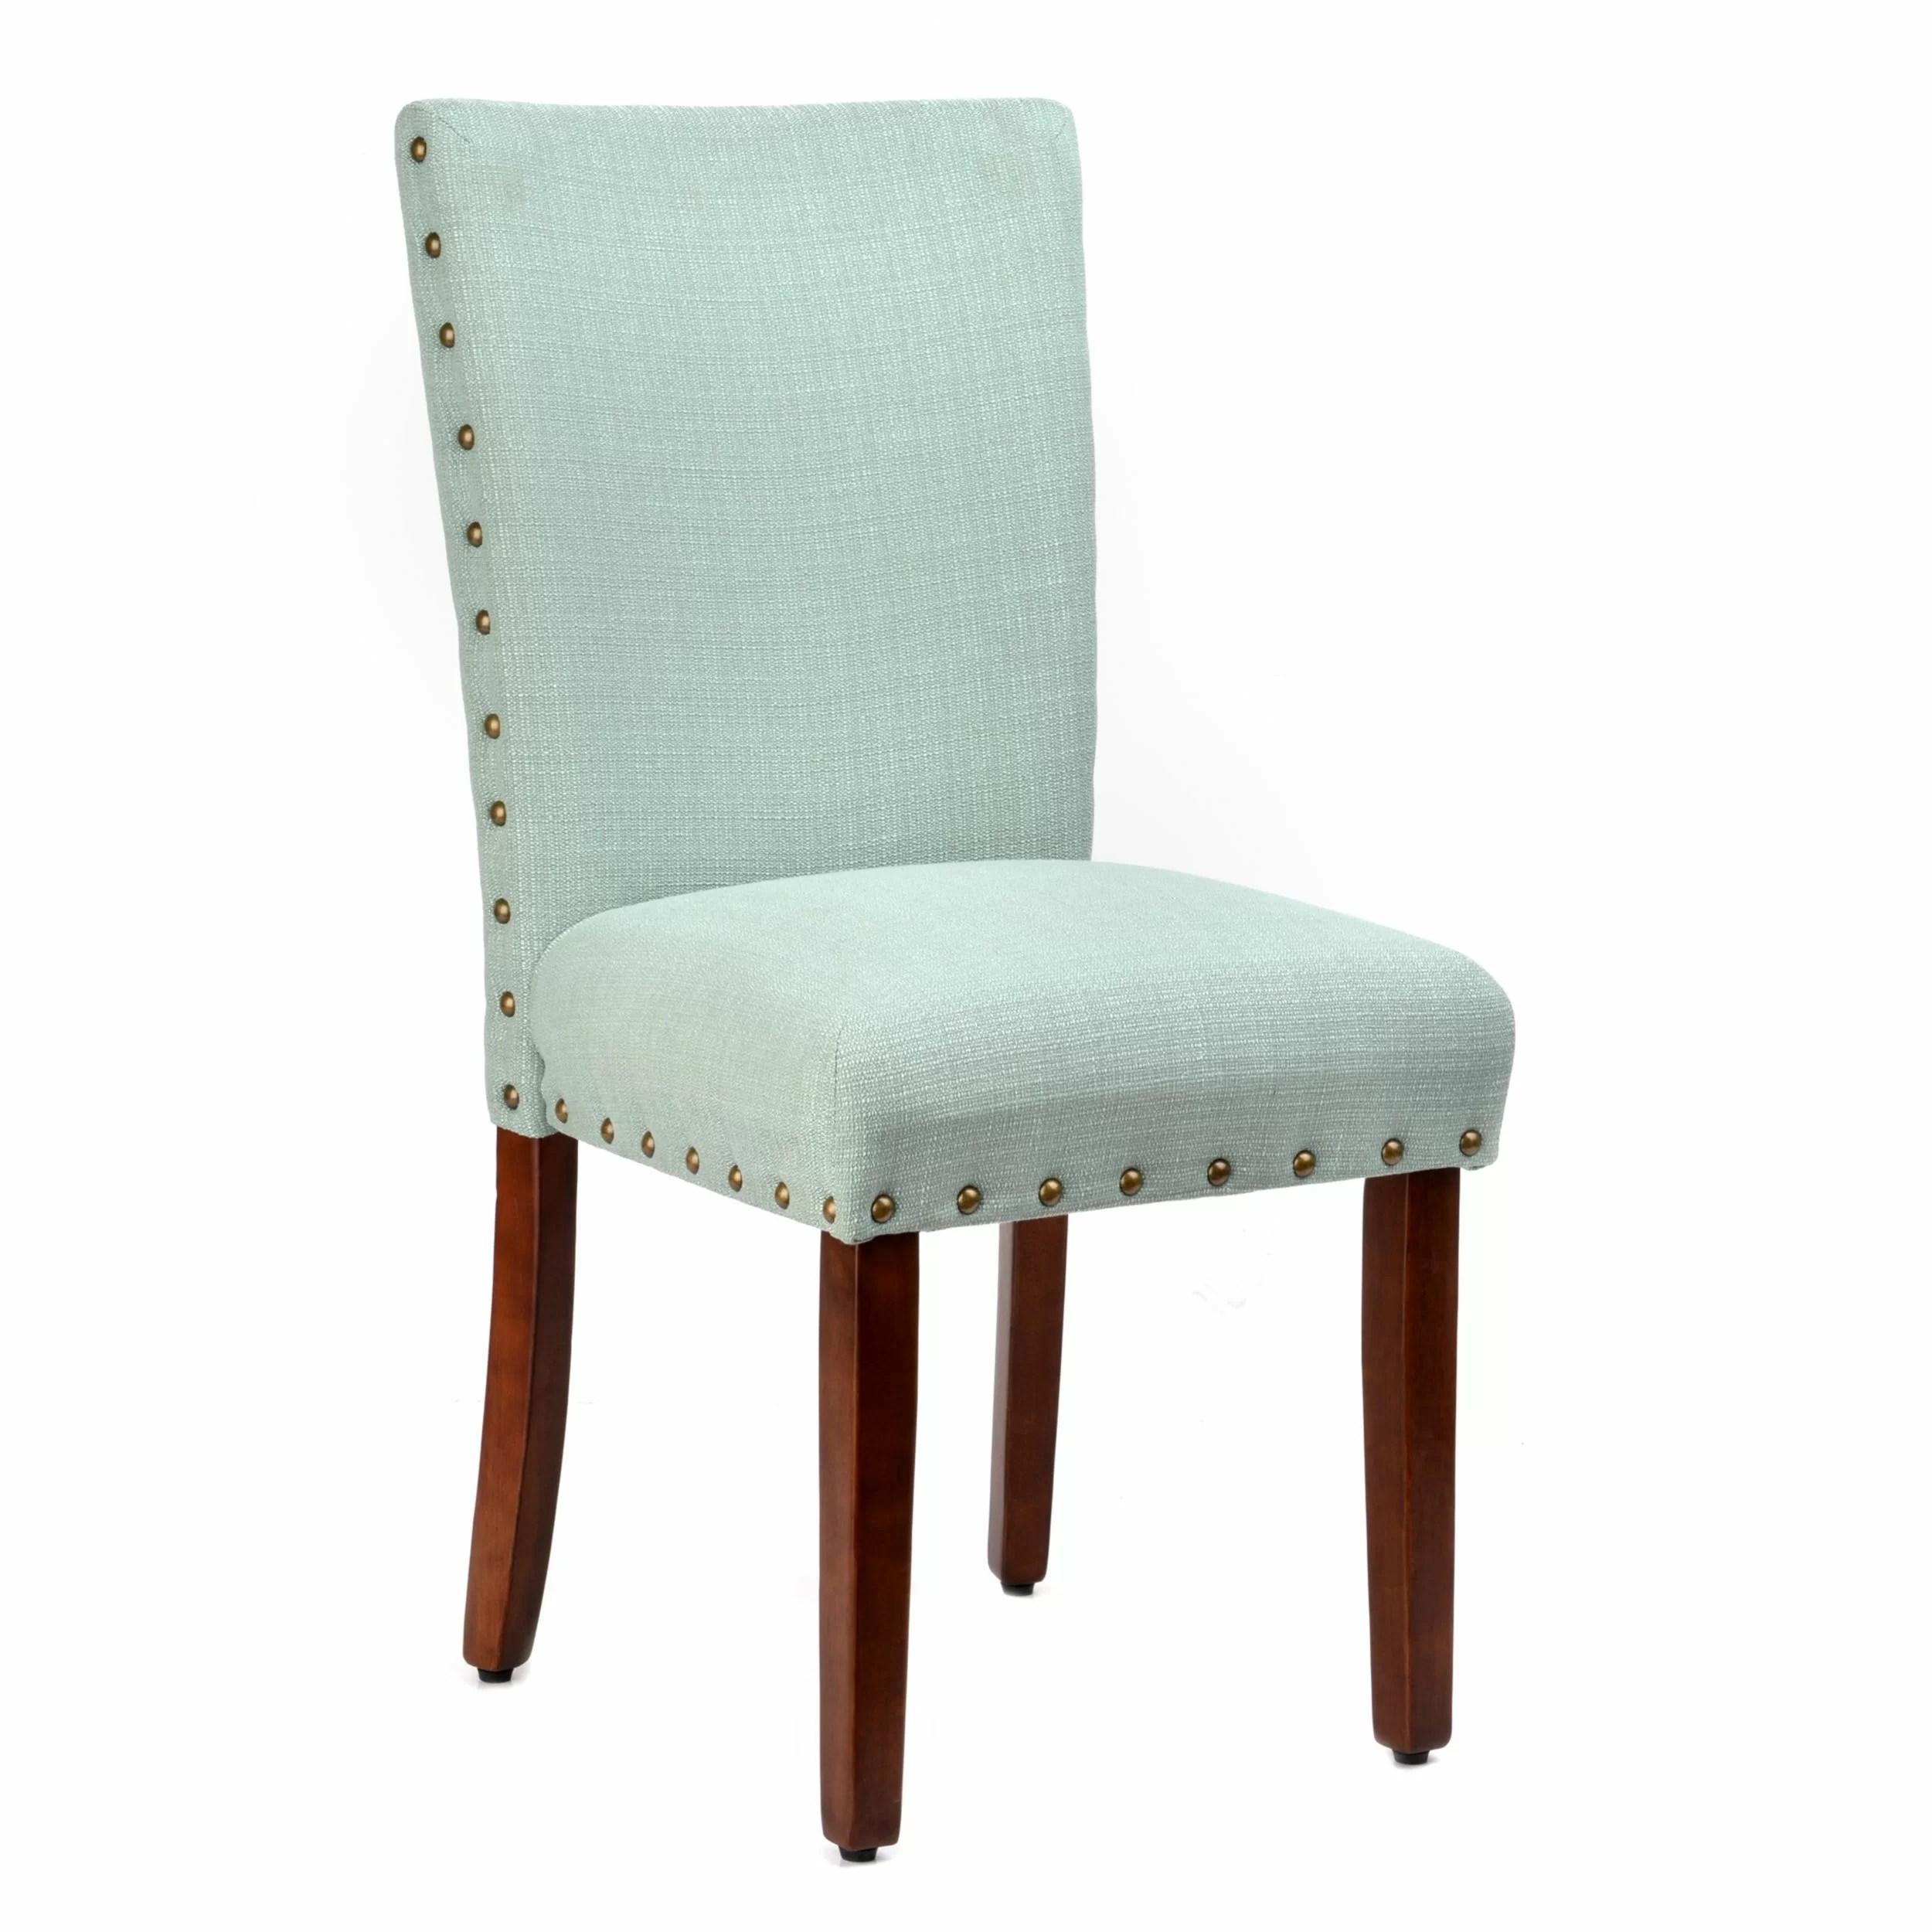 kirklands dining chairs revolving chair repair in kochi roundhill furniture elliya nailheads parsons